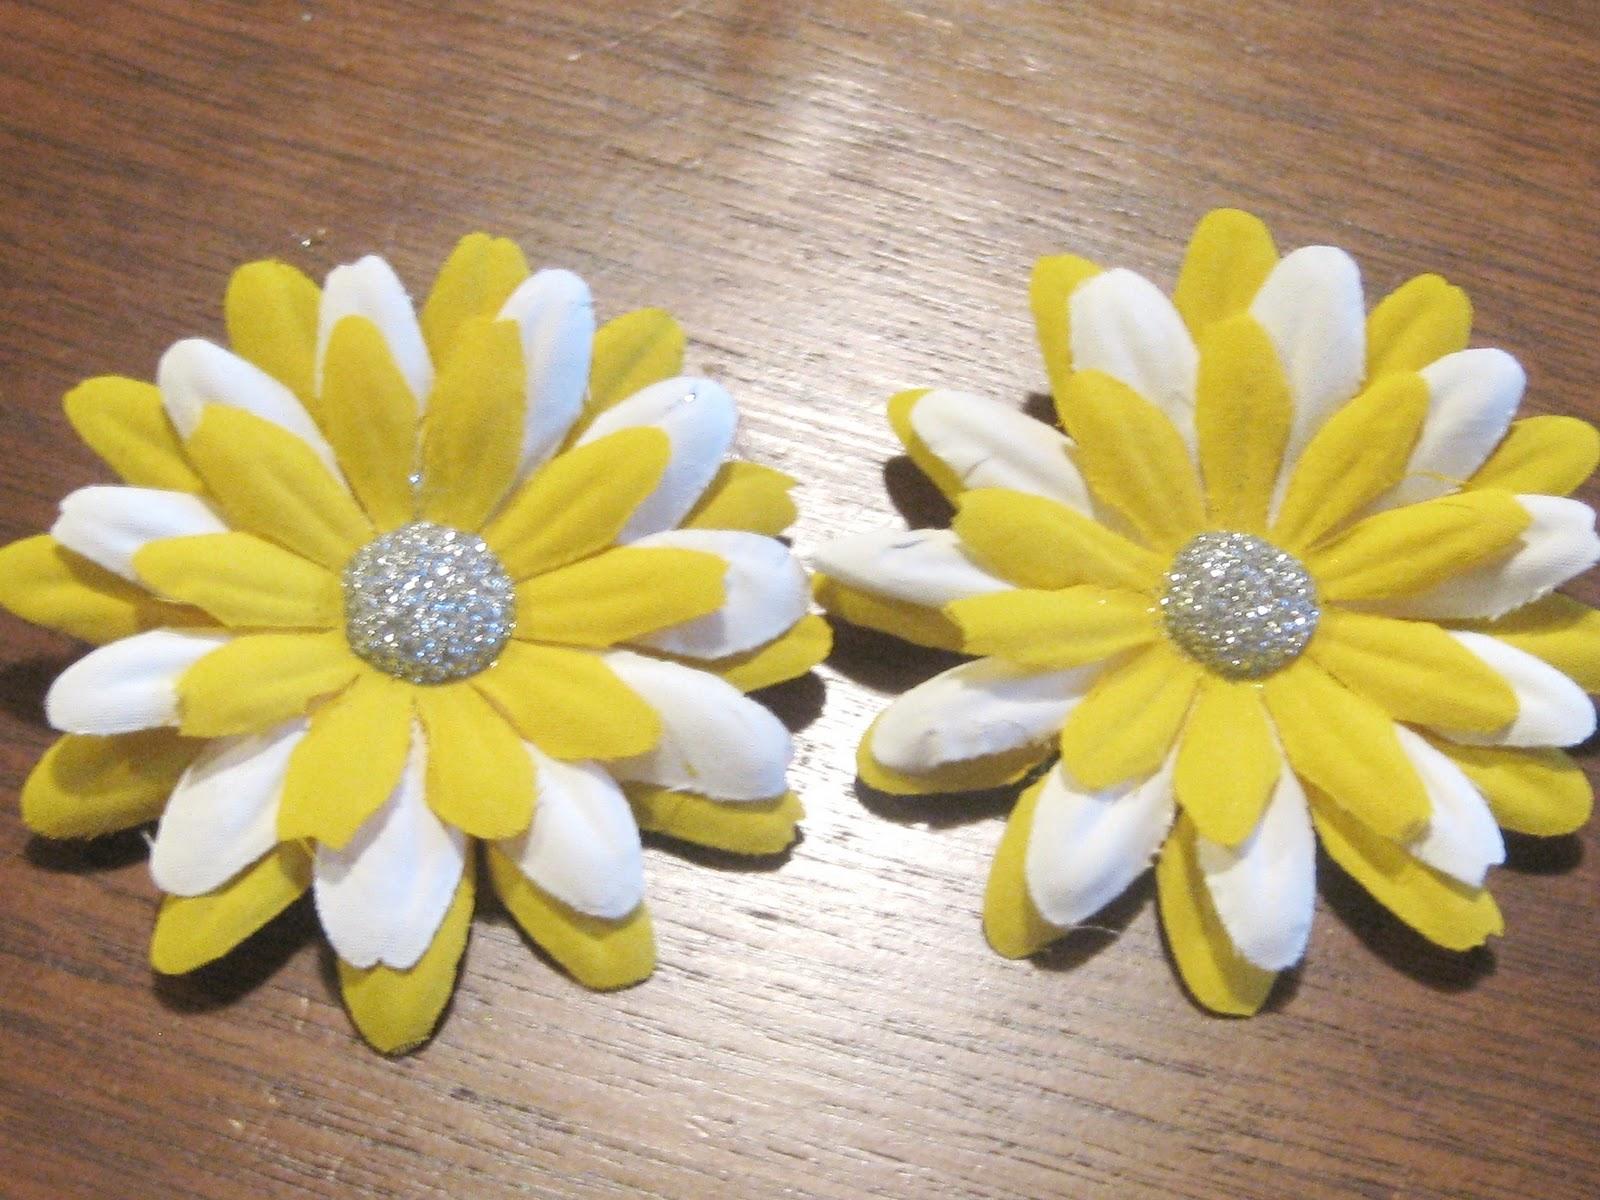 Ashleys Craft Corner Painted Flower Hair Clips